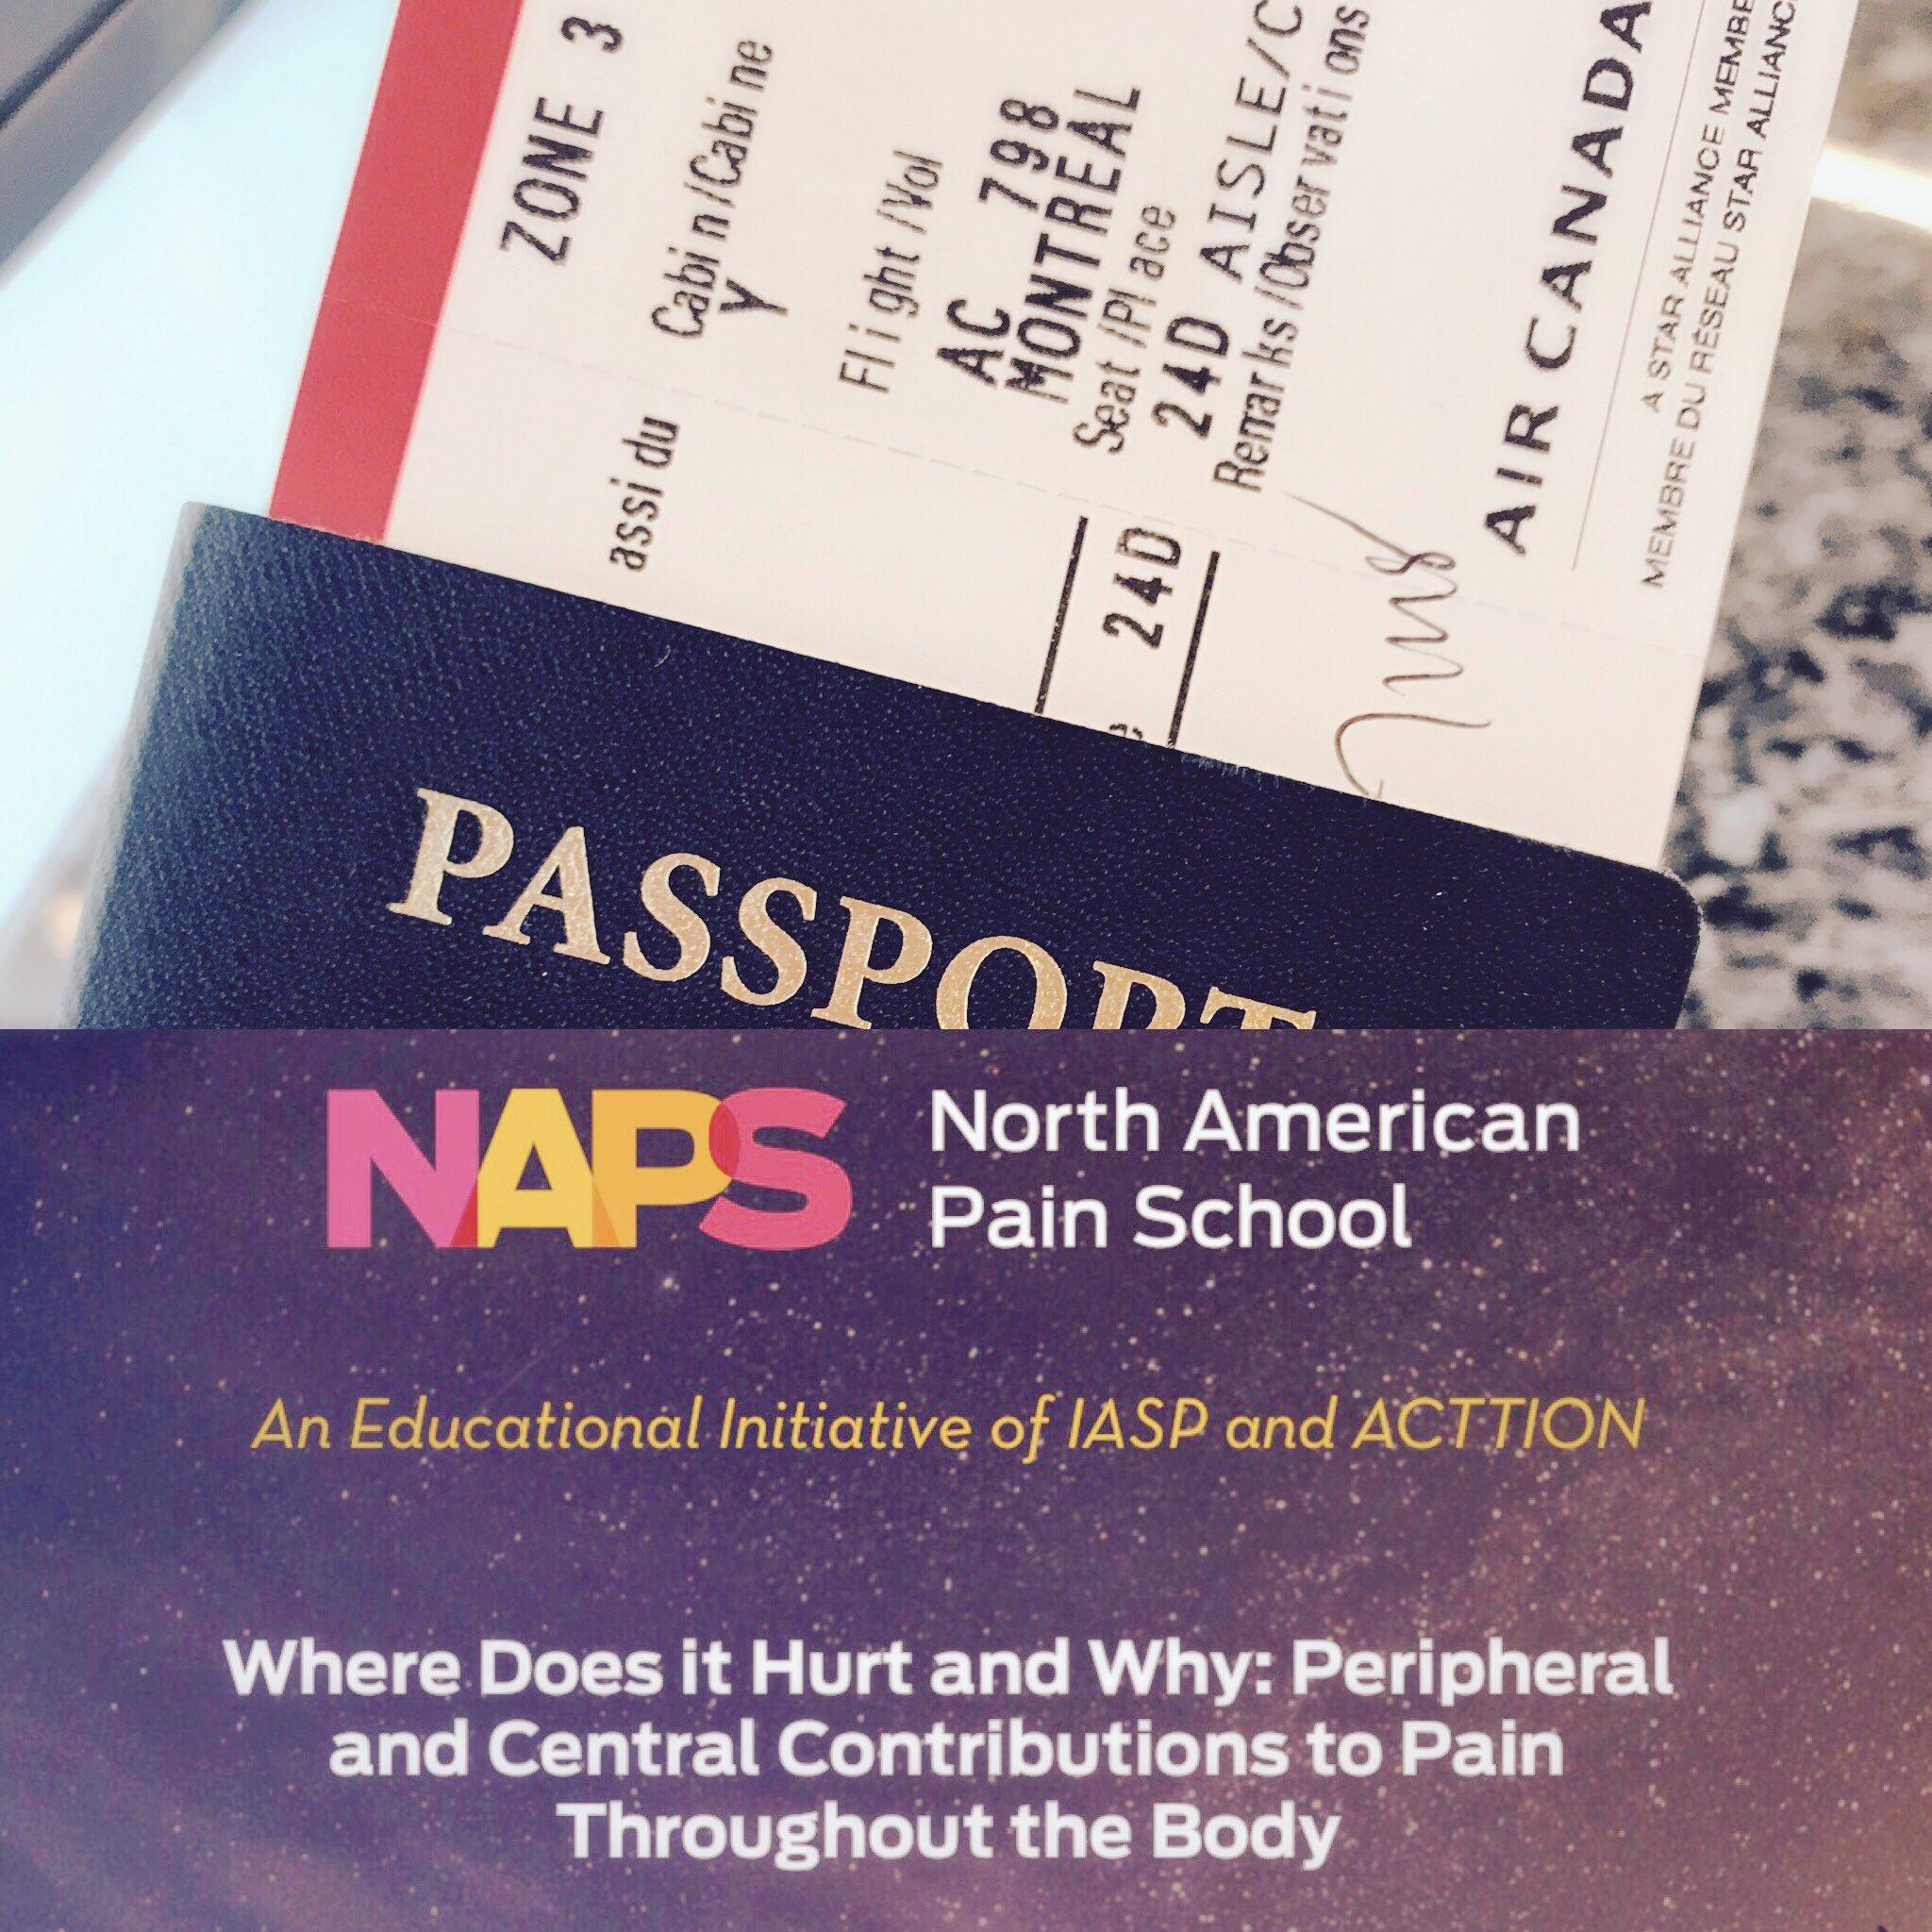 Off to #NAPainSchool! So grateful for this opportunity @NAPainSchool @rqrd_qprn @IASPPAIN @PainResForum @fairmontmontebello #luckyresearcher https://t.co/qVu7bW7lQ4